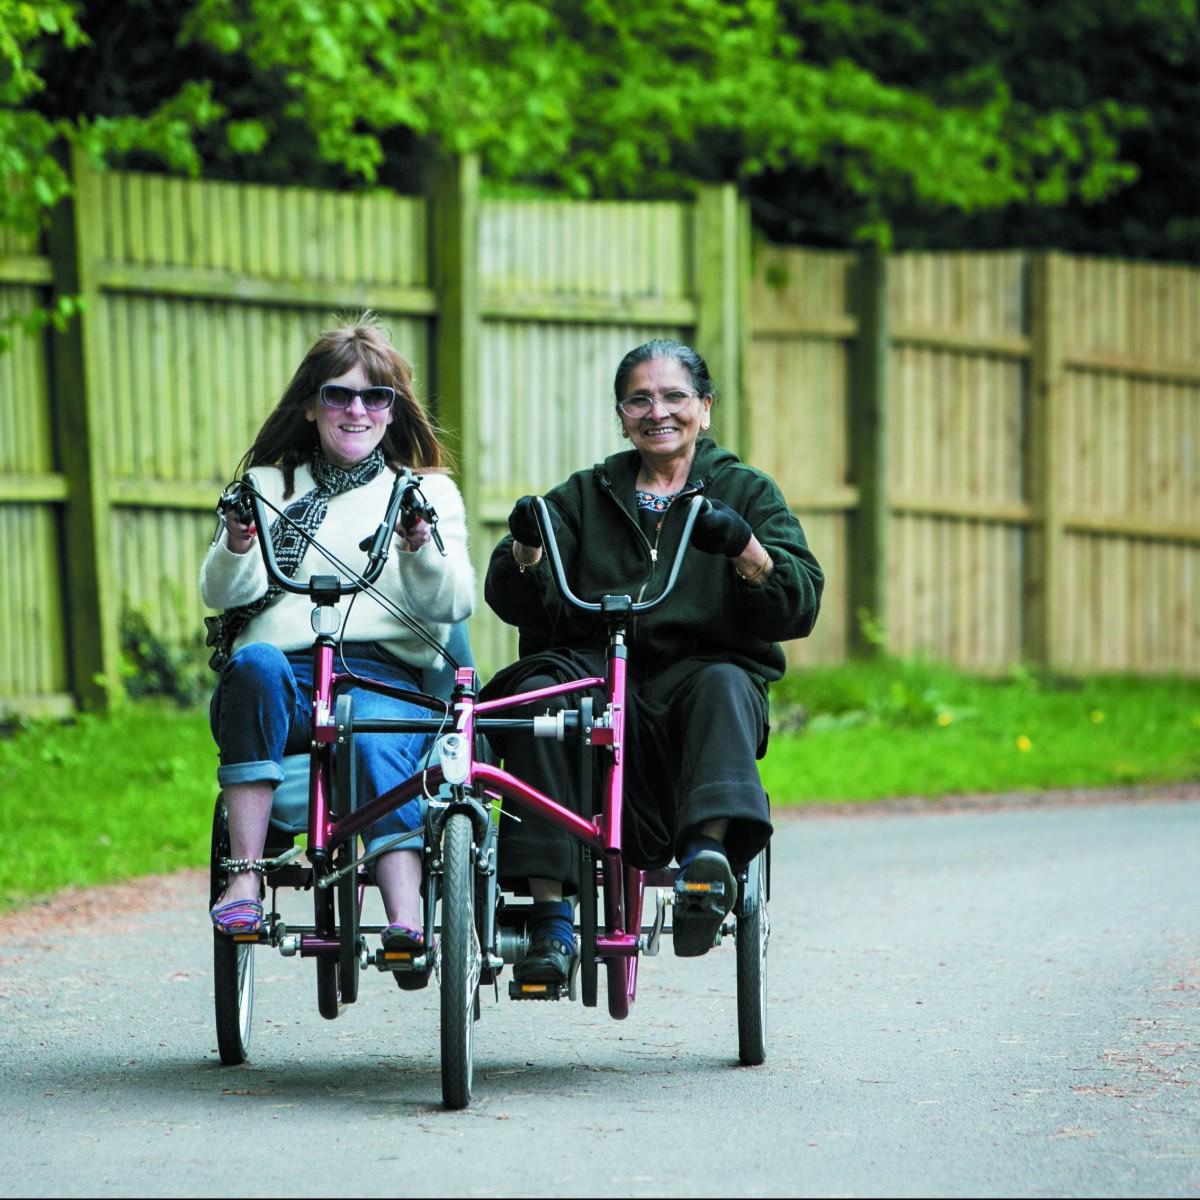 Valbai 'Wheely' Enjoys Changing Gear